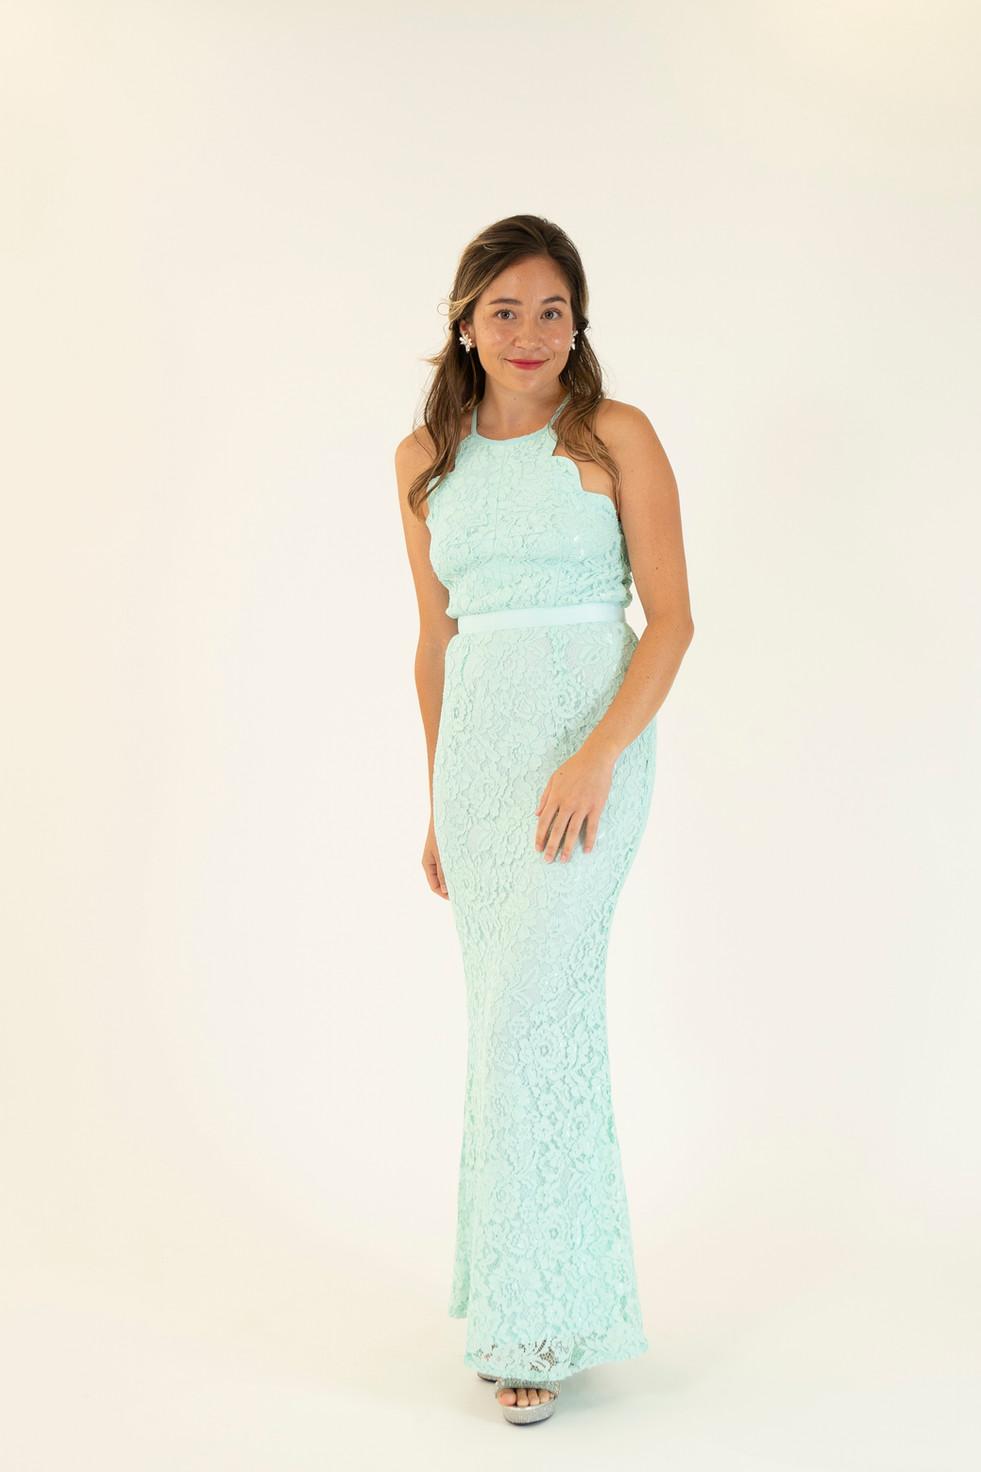 Mint Lace Scalloped Neck Dress